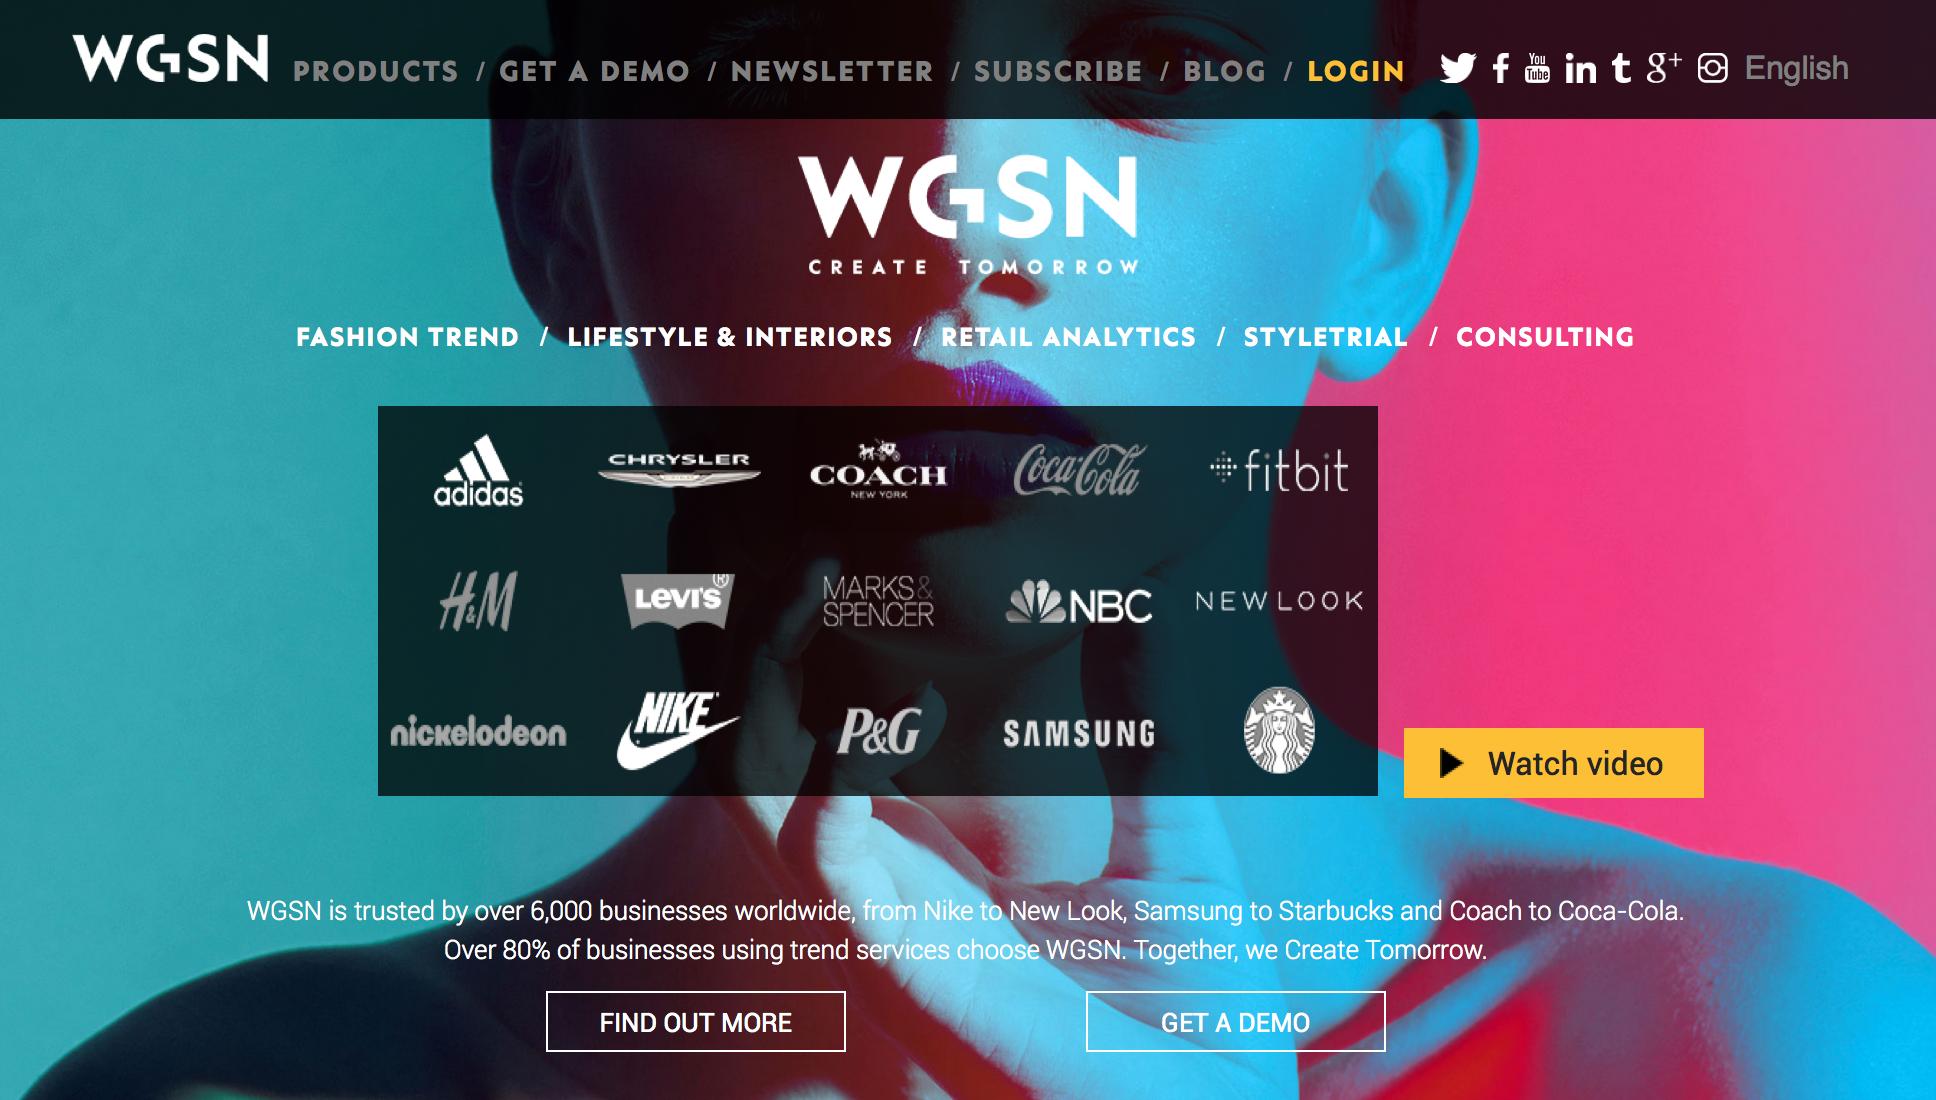 90 days WGSN access